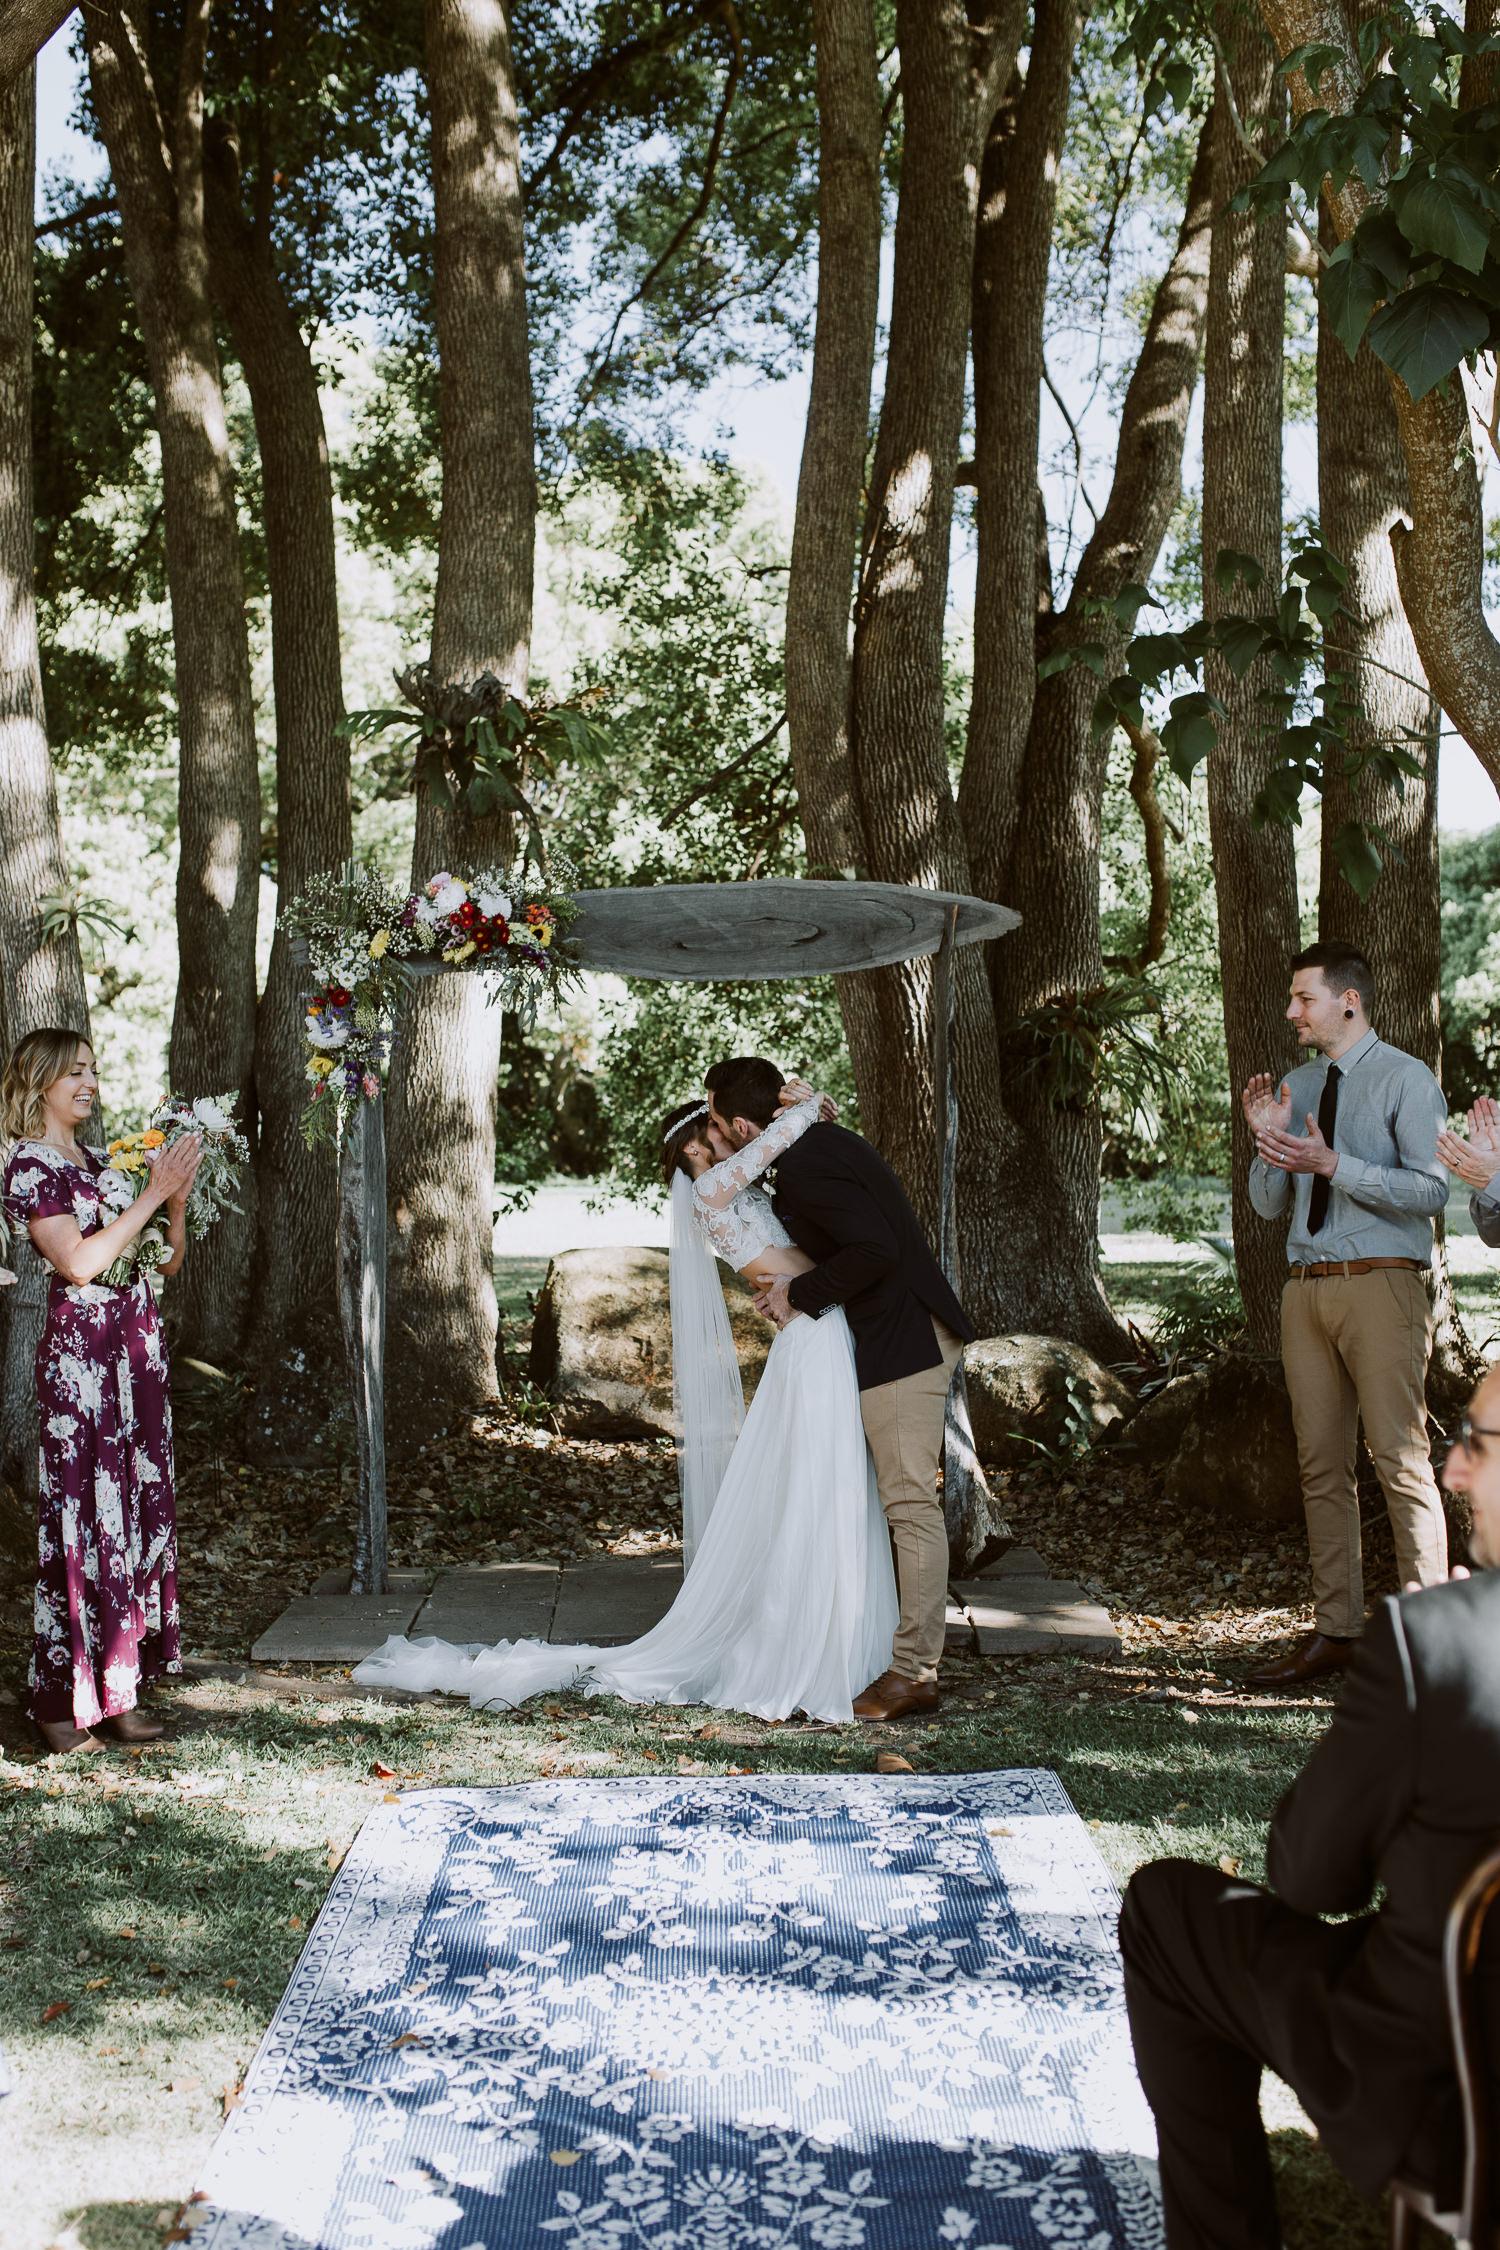 byron_bay_wedding_photographer047.jpg